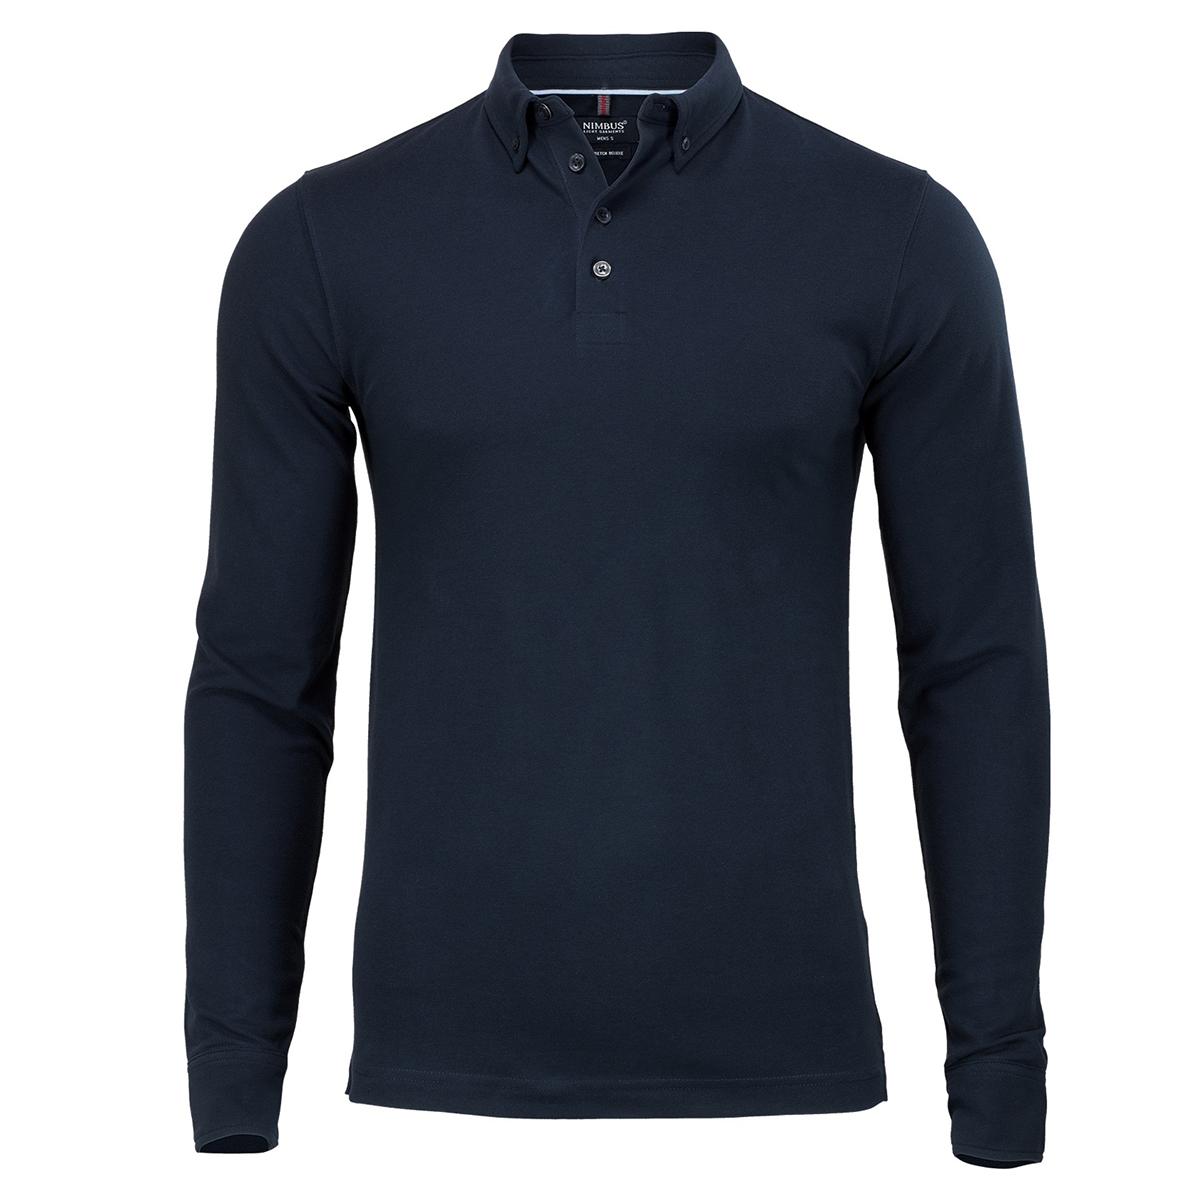 Nimbus Mens Carlington Deluxe Long Sleeve Polo Shirt (3XL) (Black)